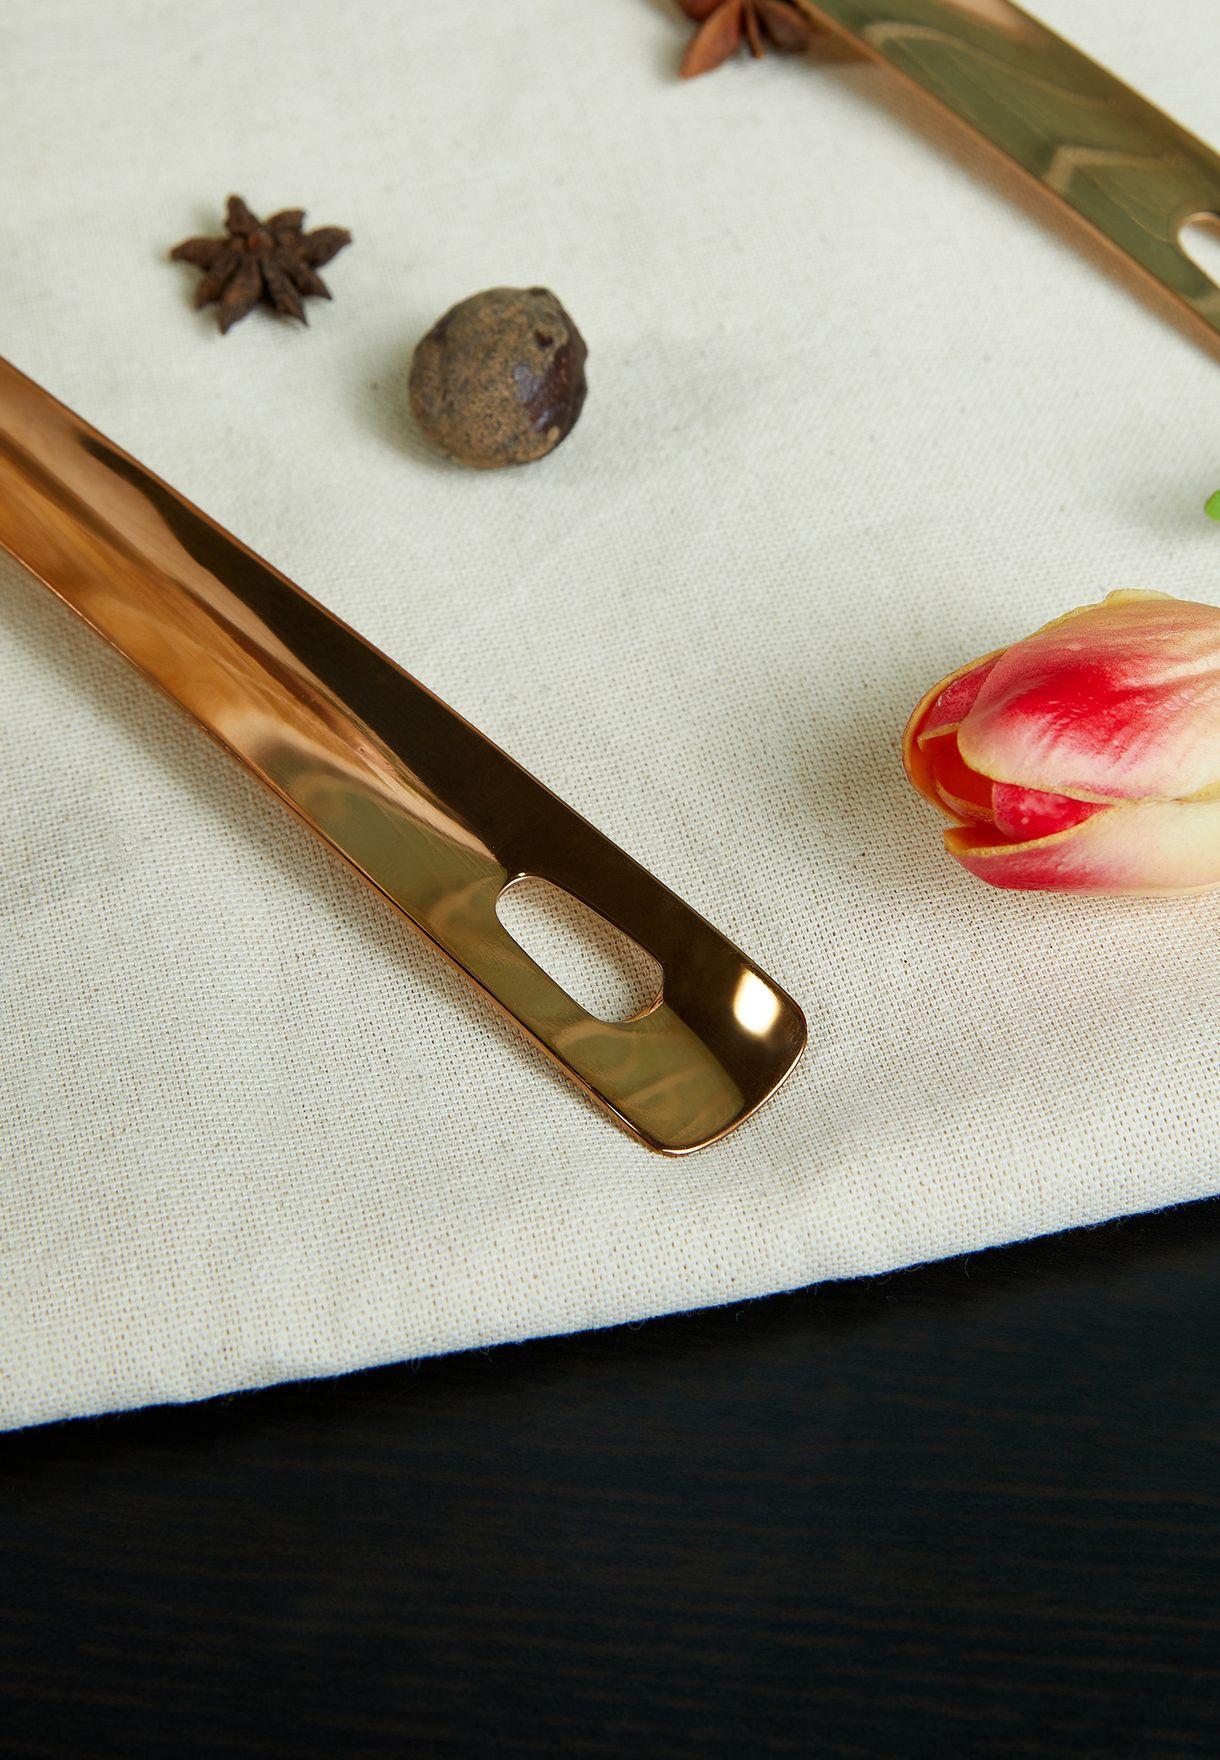 Freya Stainless Steel Rose Gold Ladle